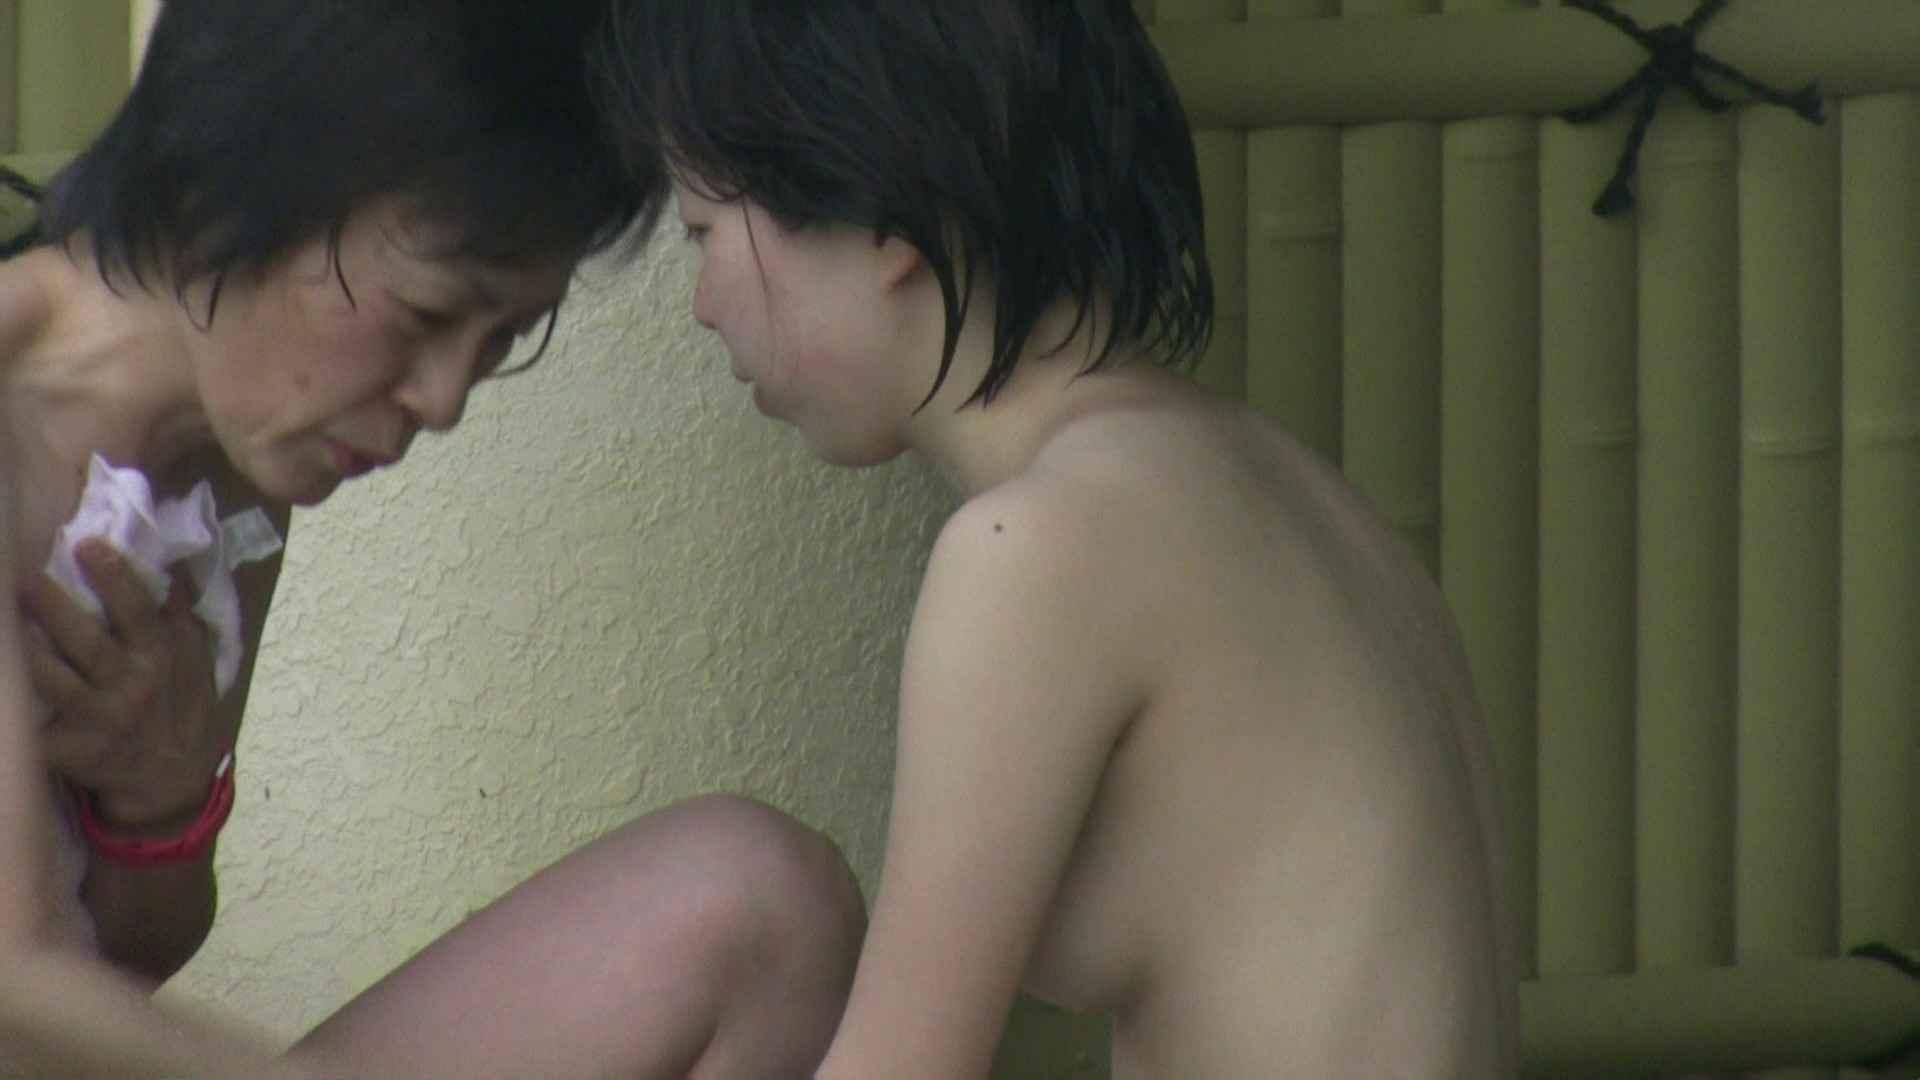 Aquaな露天風呂Vol.06【VIP】 露天 オマンコ無修正動画無料 113PICs 26